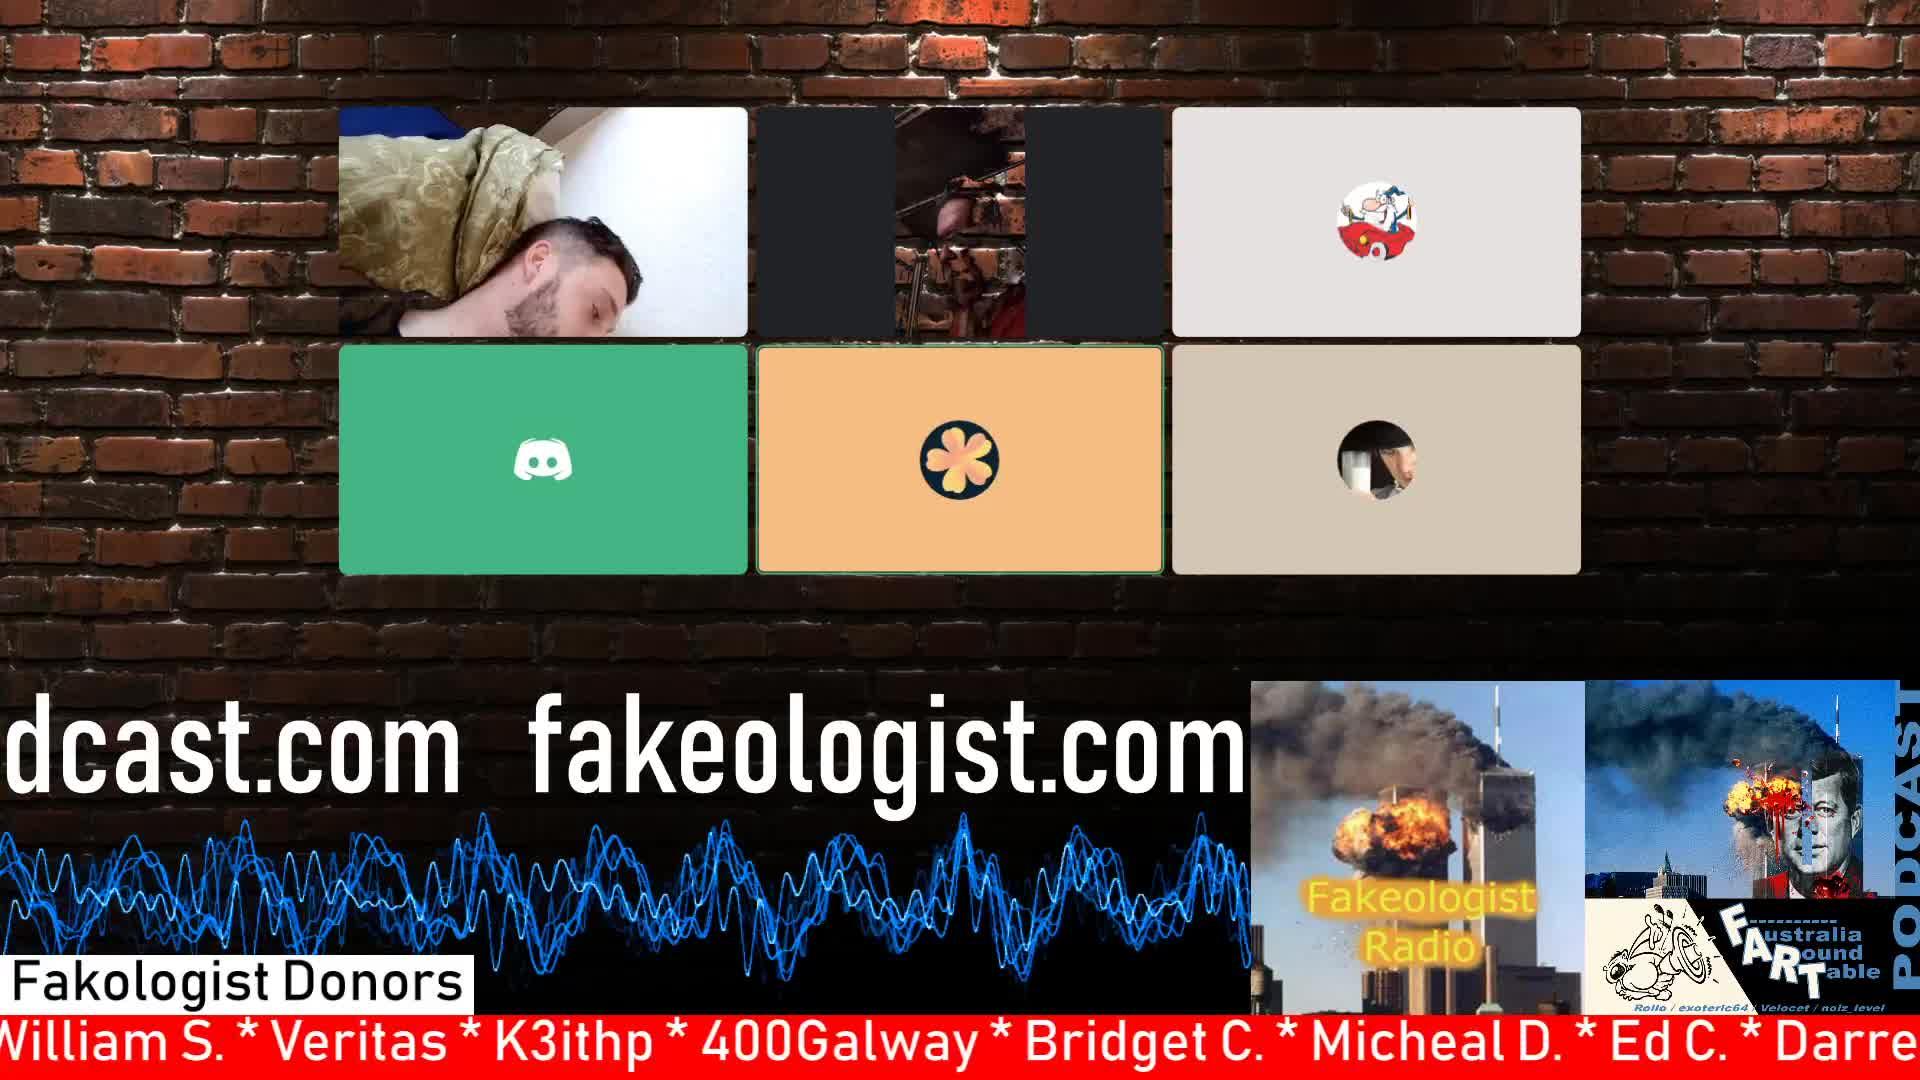 F.A.R.T. - Sat 3rd October 2020 on 03-Oct-20-11:09:13